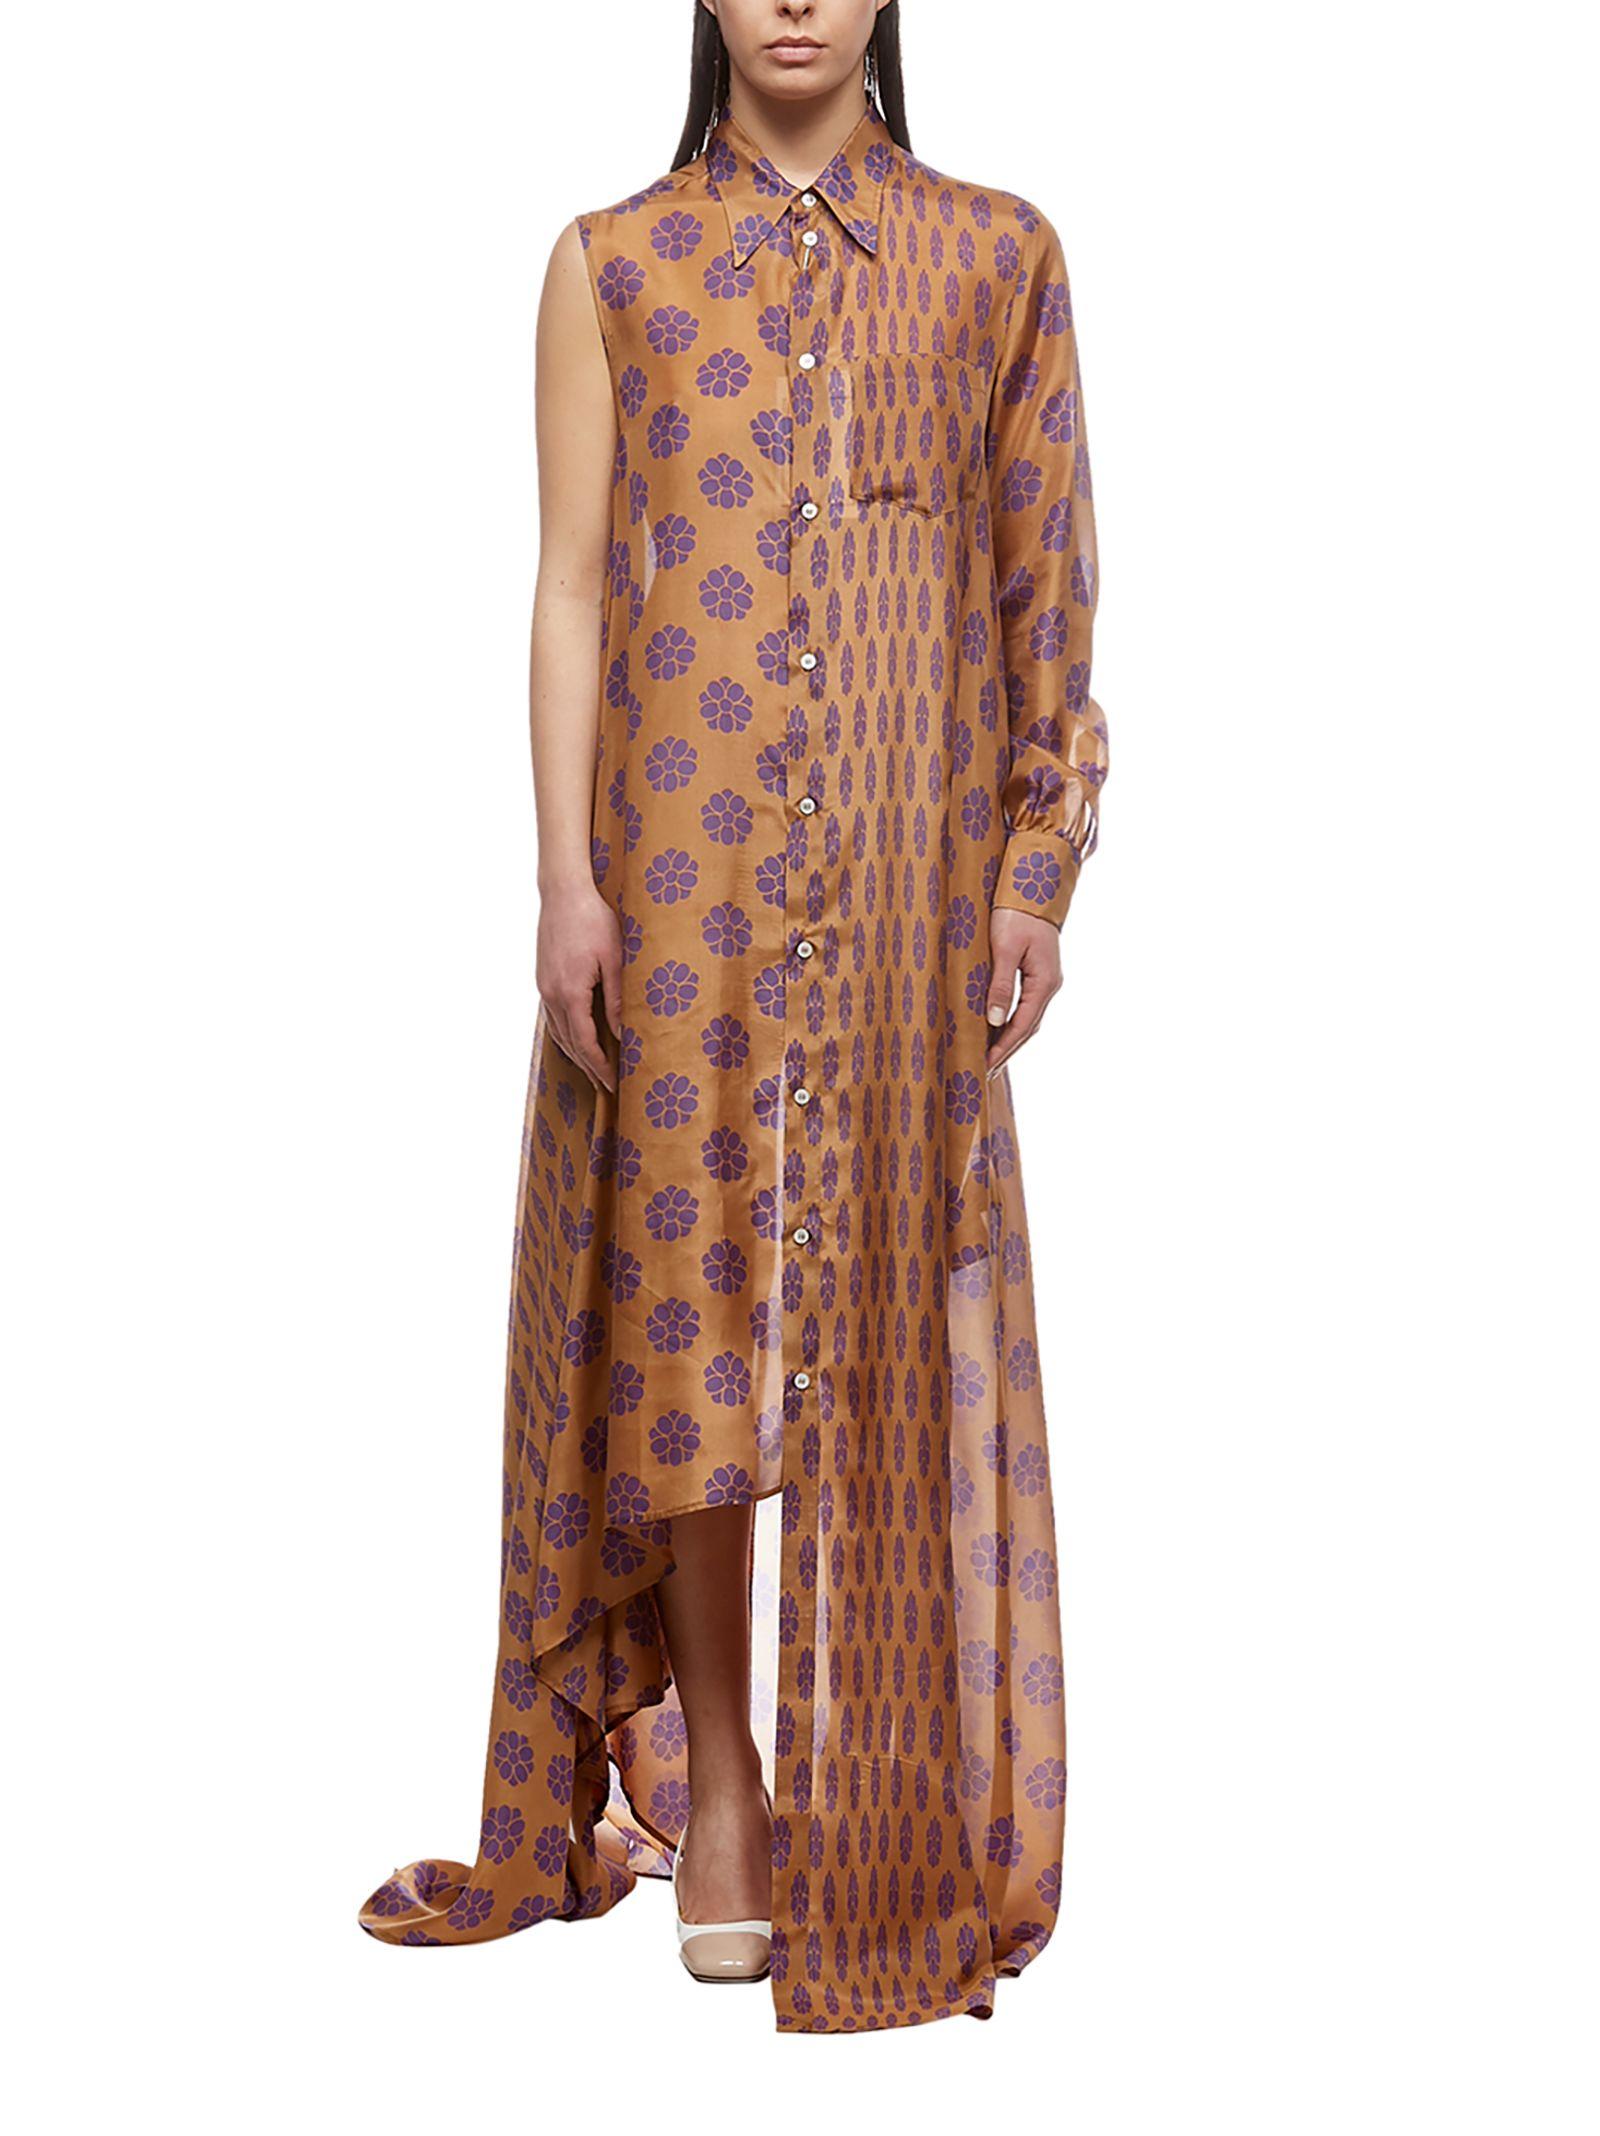 Mm6 Maison Margiela Dresses DRESS